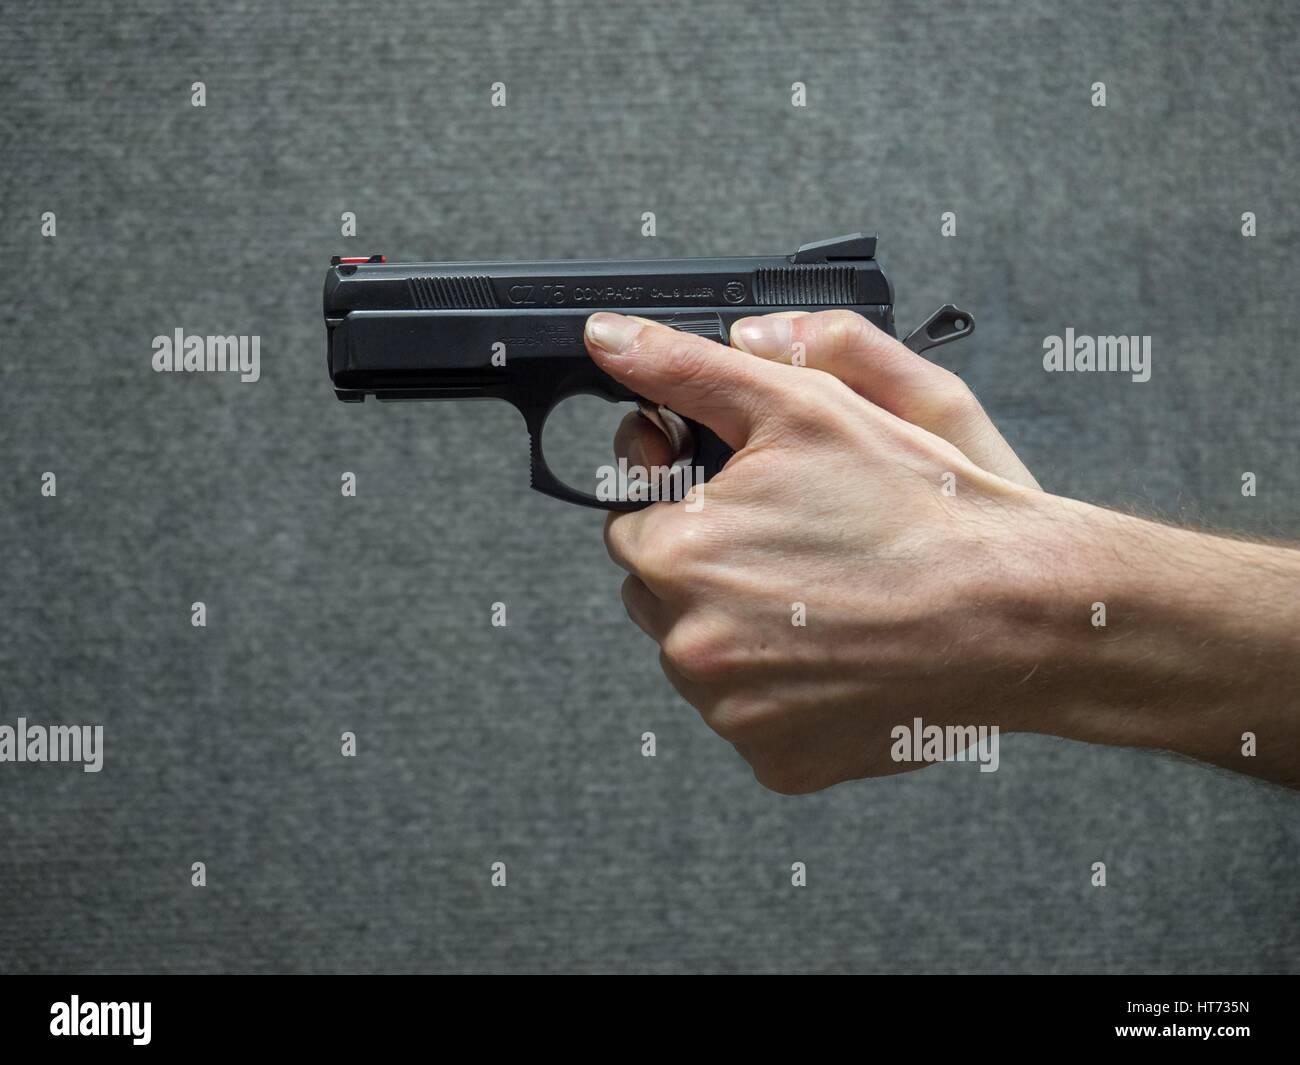 CZ 75 D Compact cal. 9 Luger pistol - Stock Image